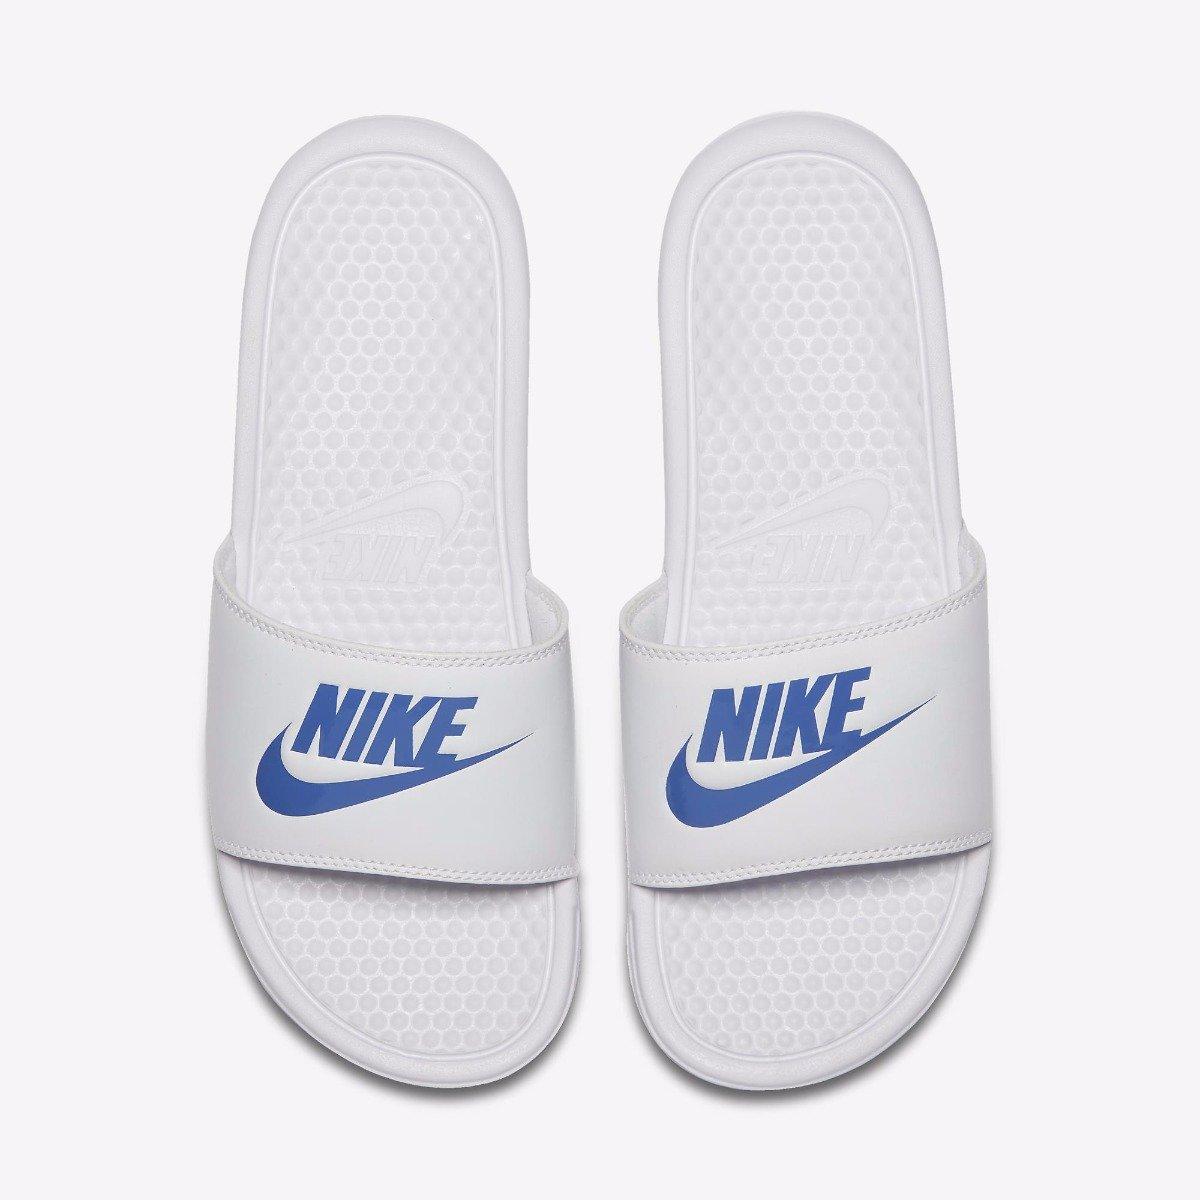 70a16619574 Chinelo Nike Benassi Just Do It 343880-102 - Branco Azul - Botas ...